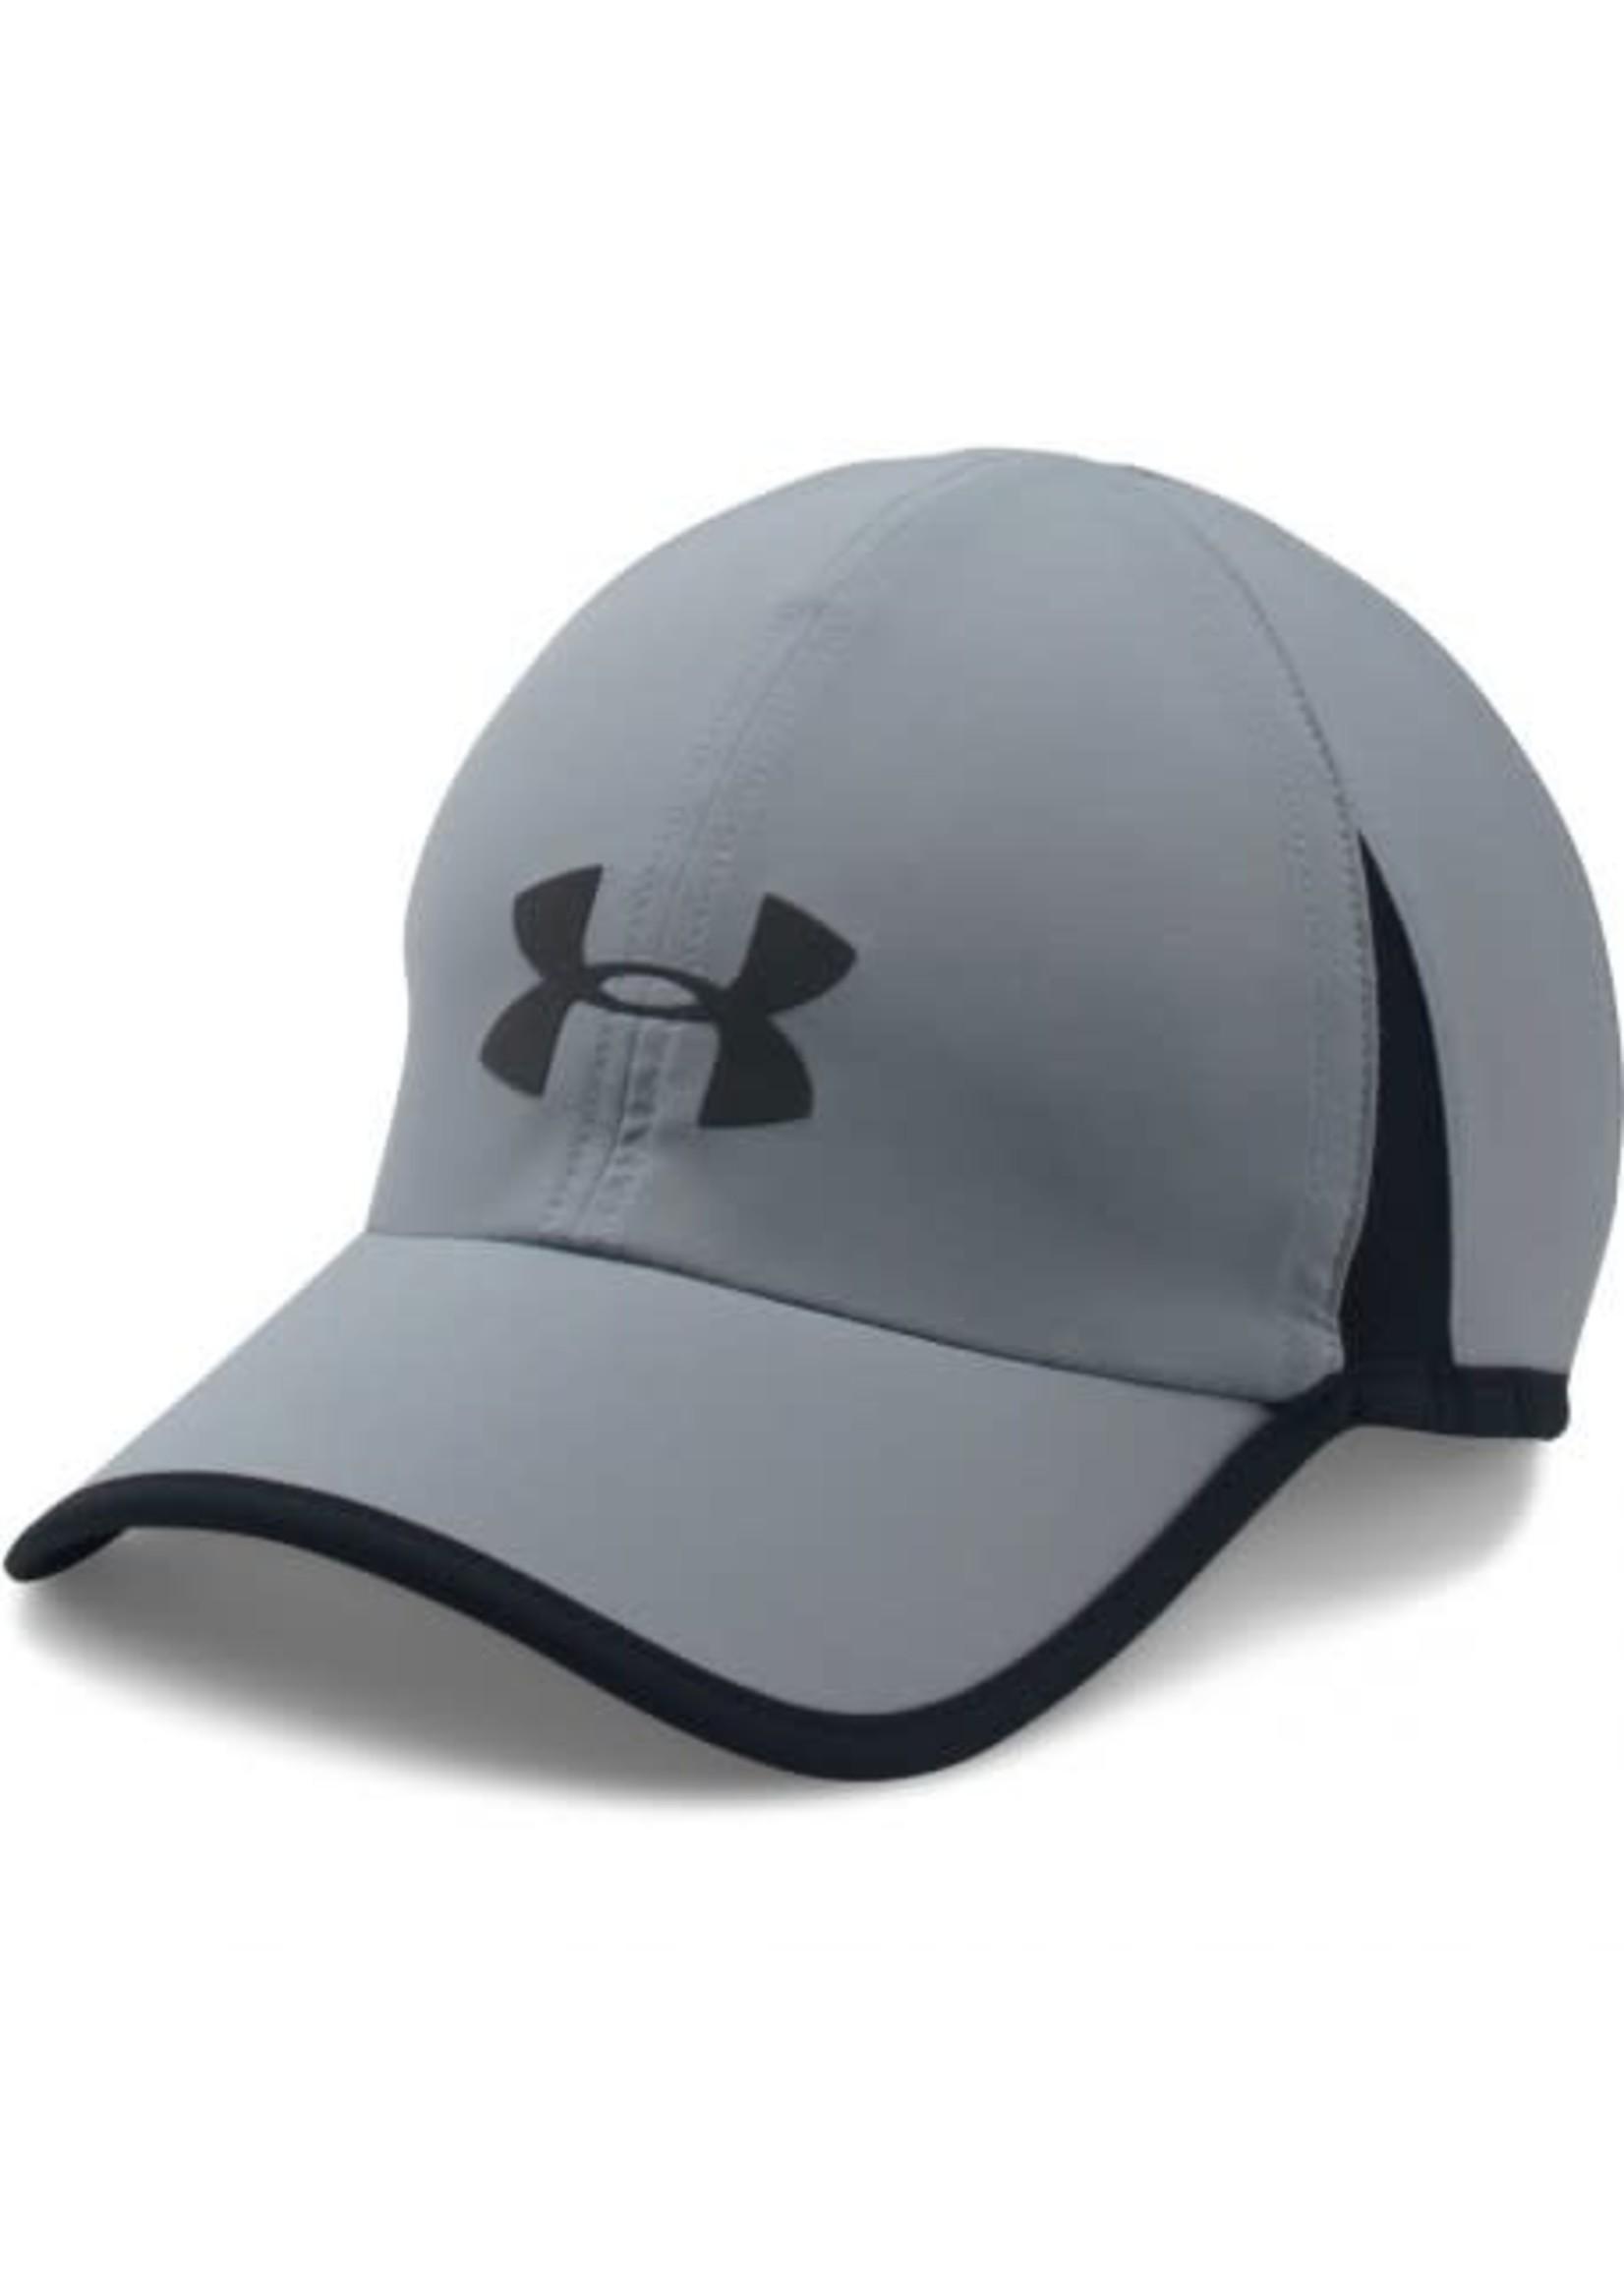 Under Armour MENS SHADOW CAP 4.0 1291840